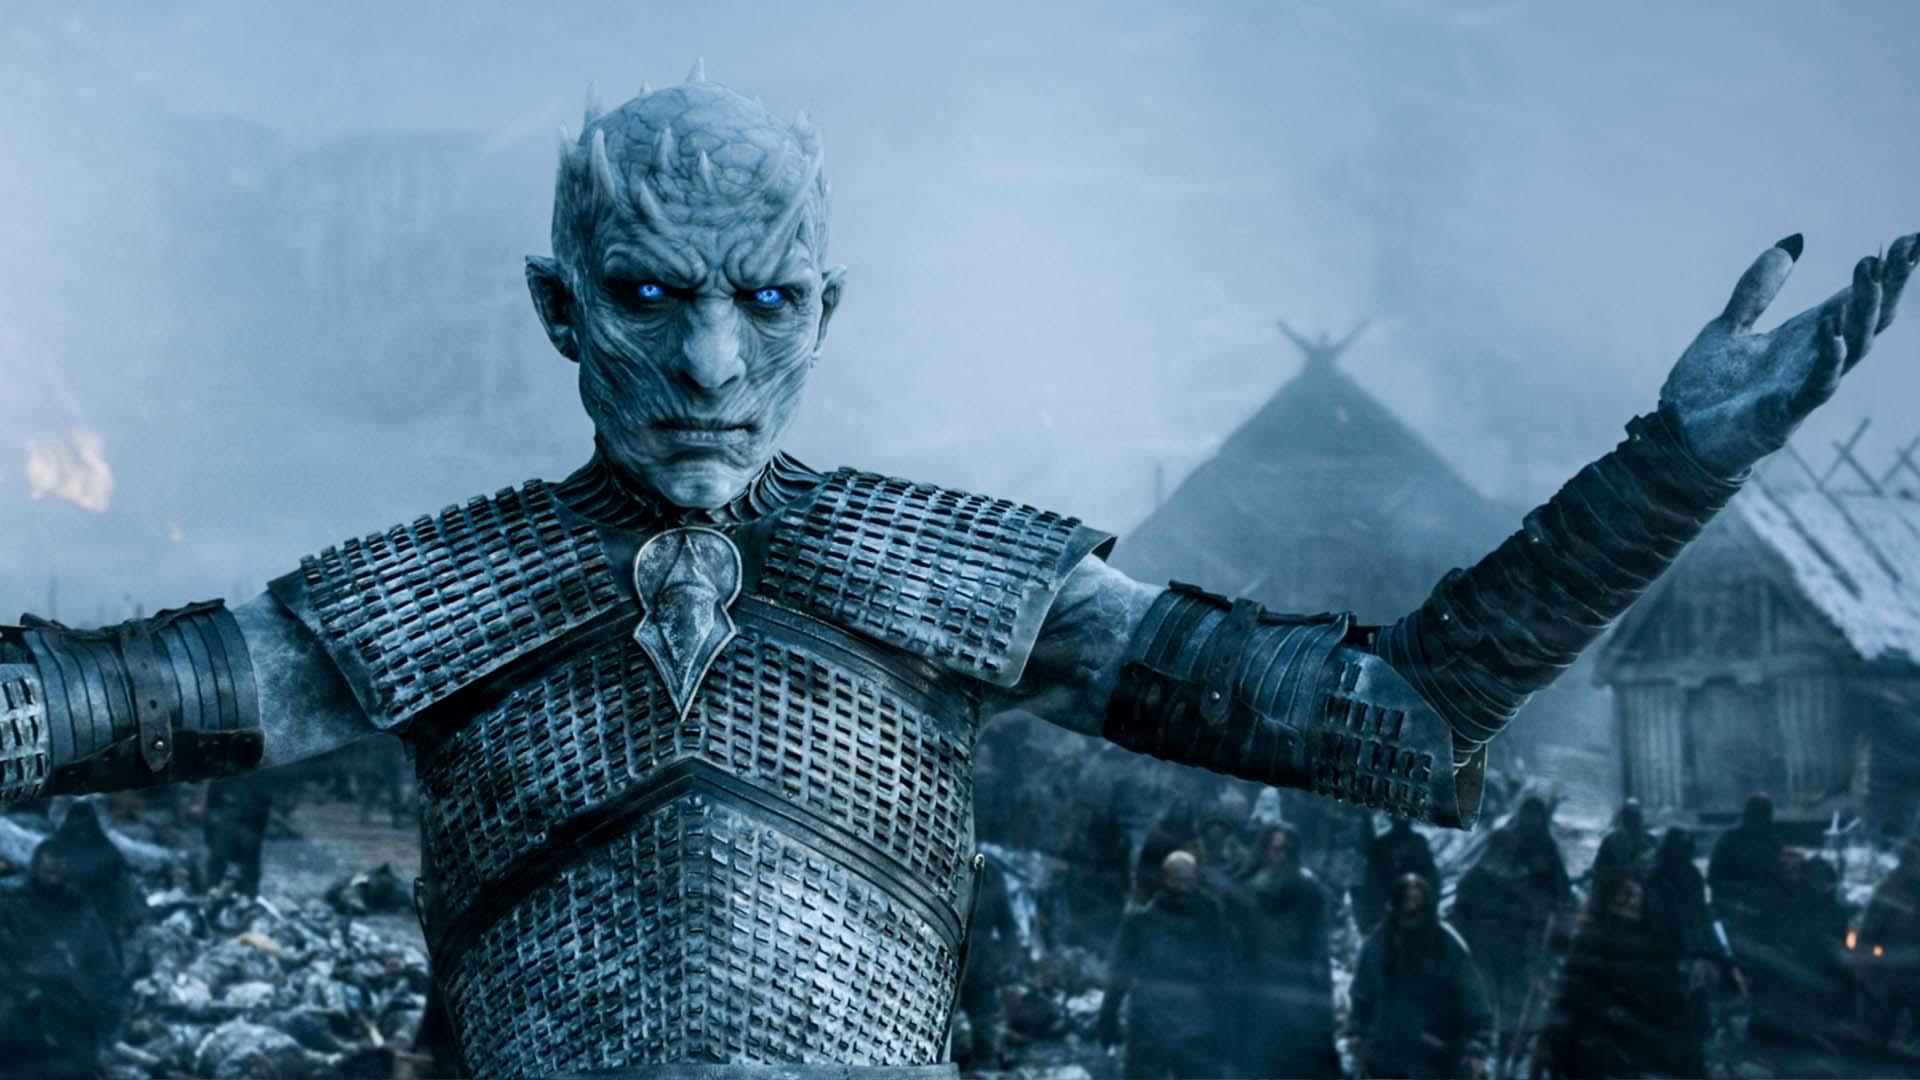 game of thrones 46 - Game of Thrones - Das große Serienfinale